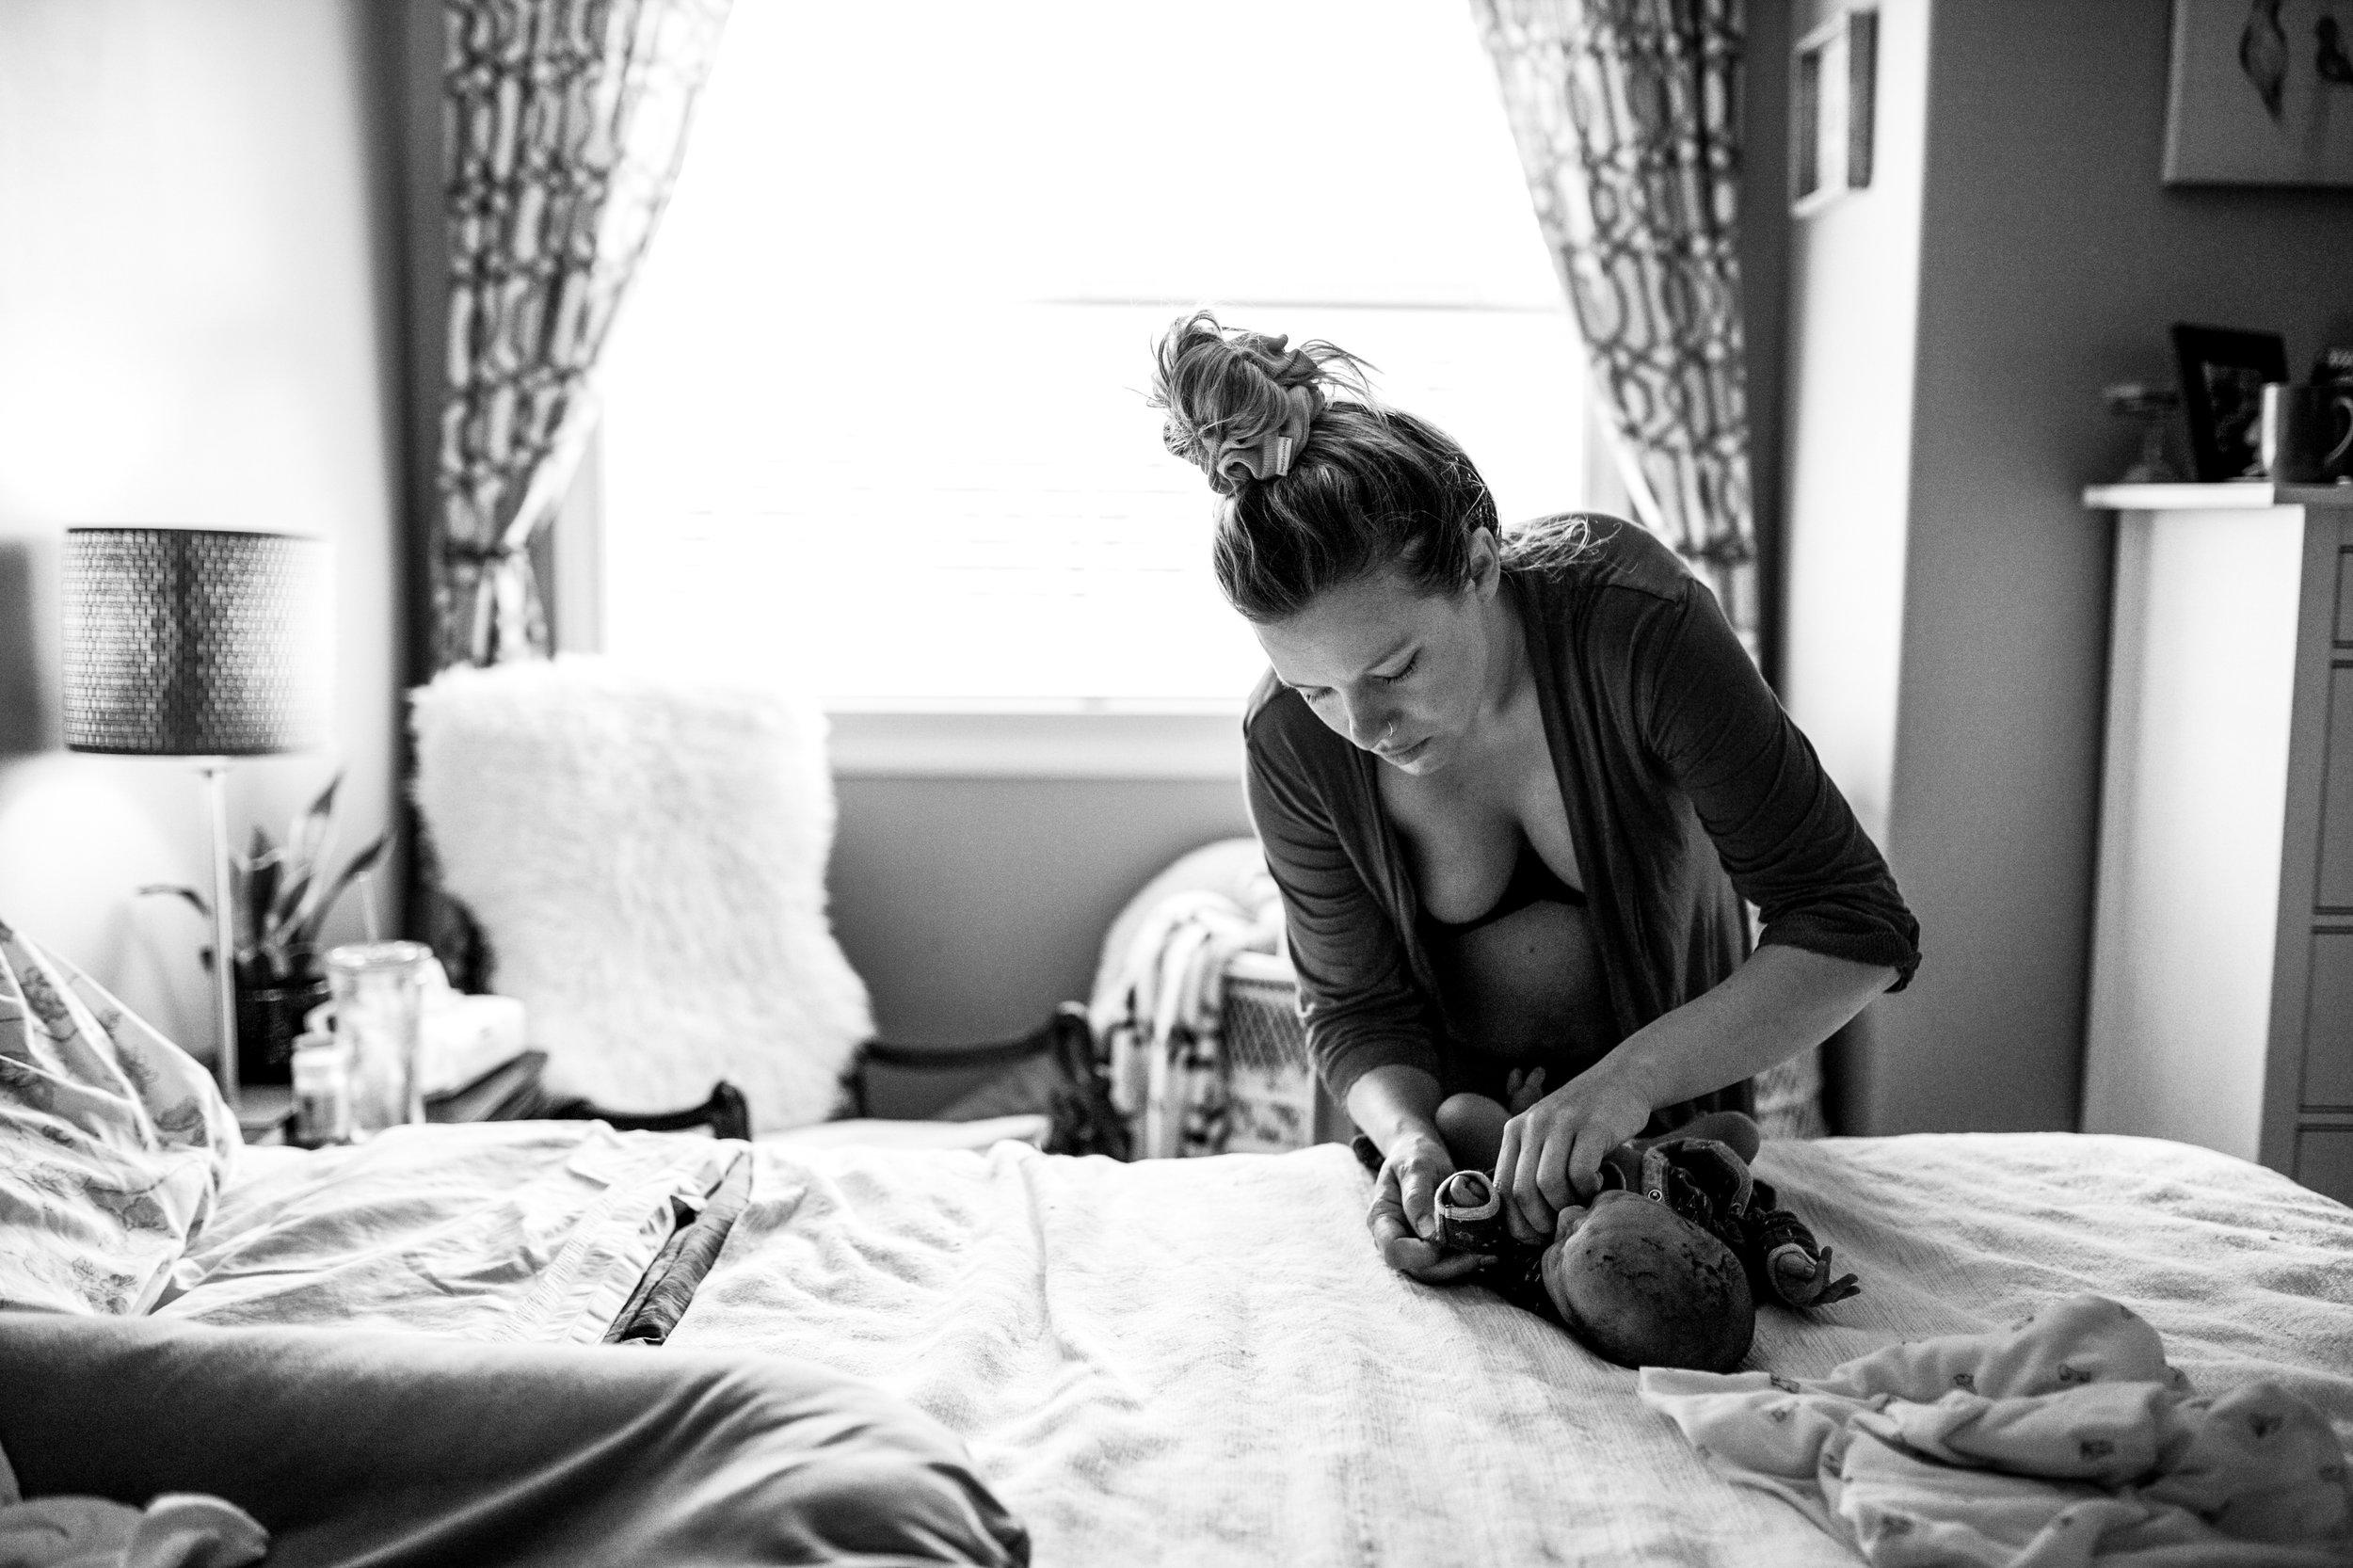 woman-dressing-her-newborn-on-bed.jpg